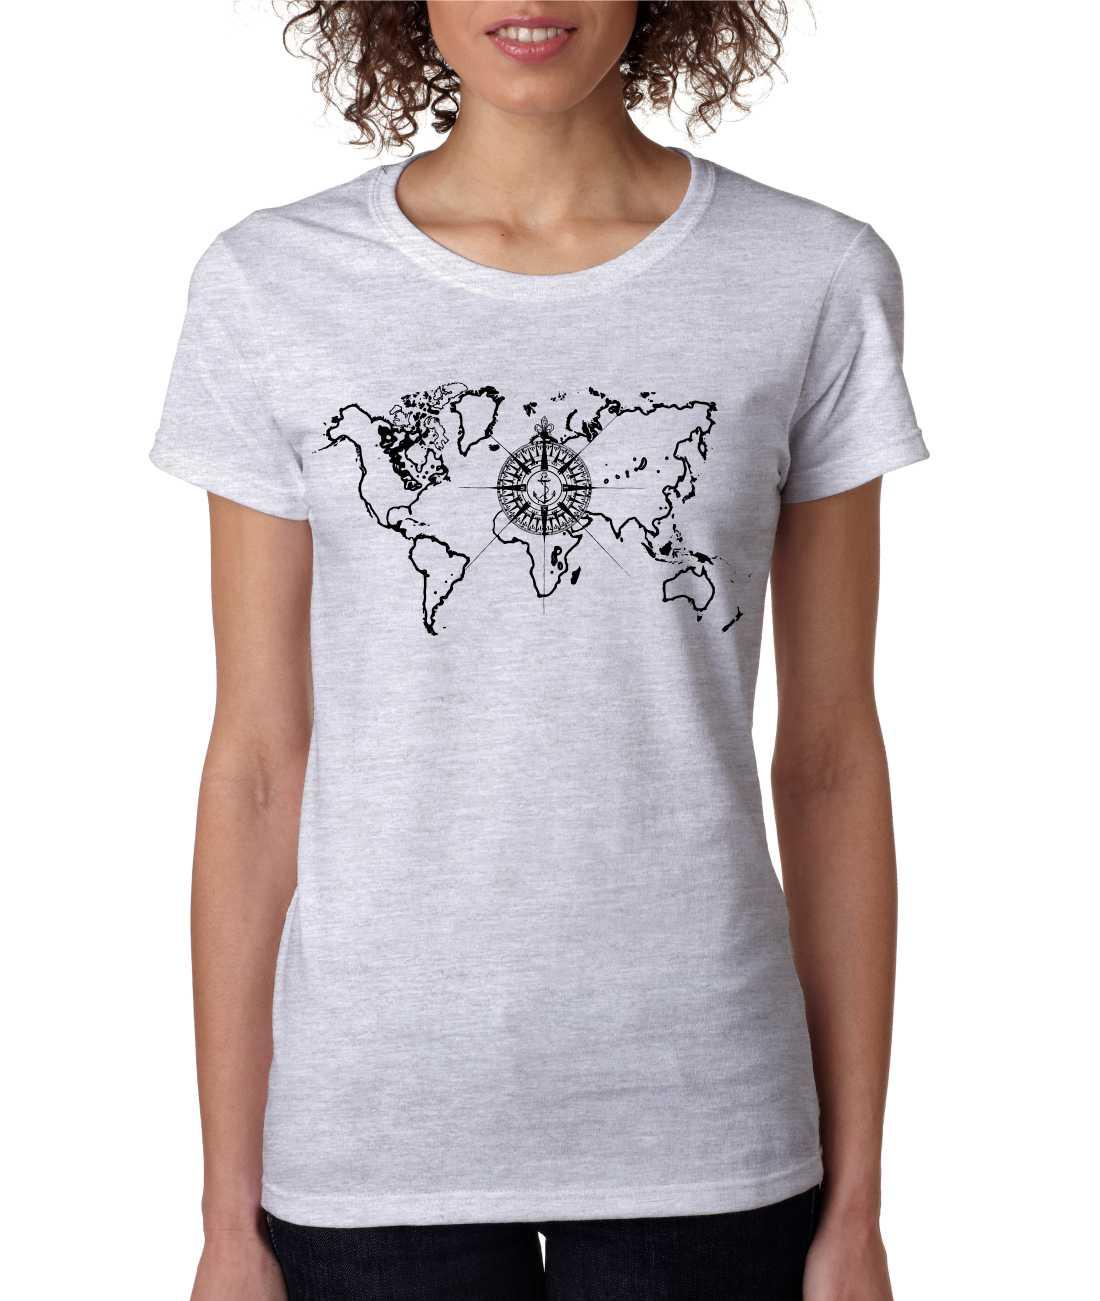 Women 39 S T Shirt World Map Compass Cool Graphic Tee Ebay